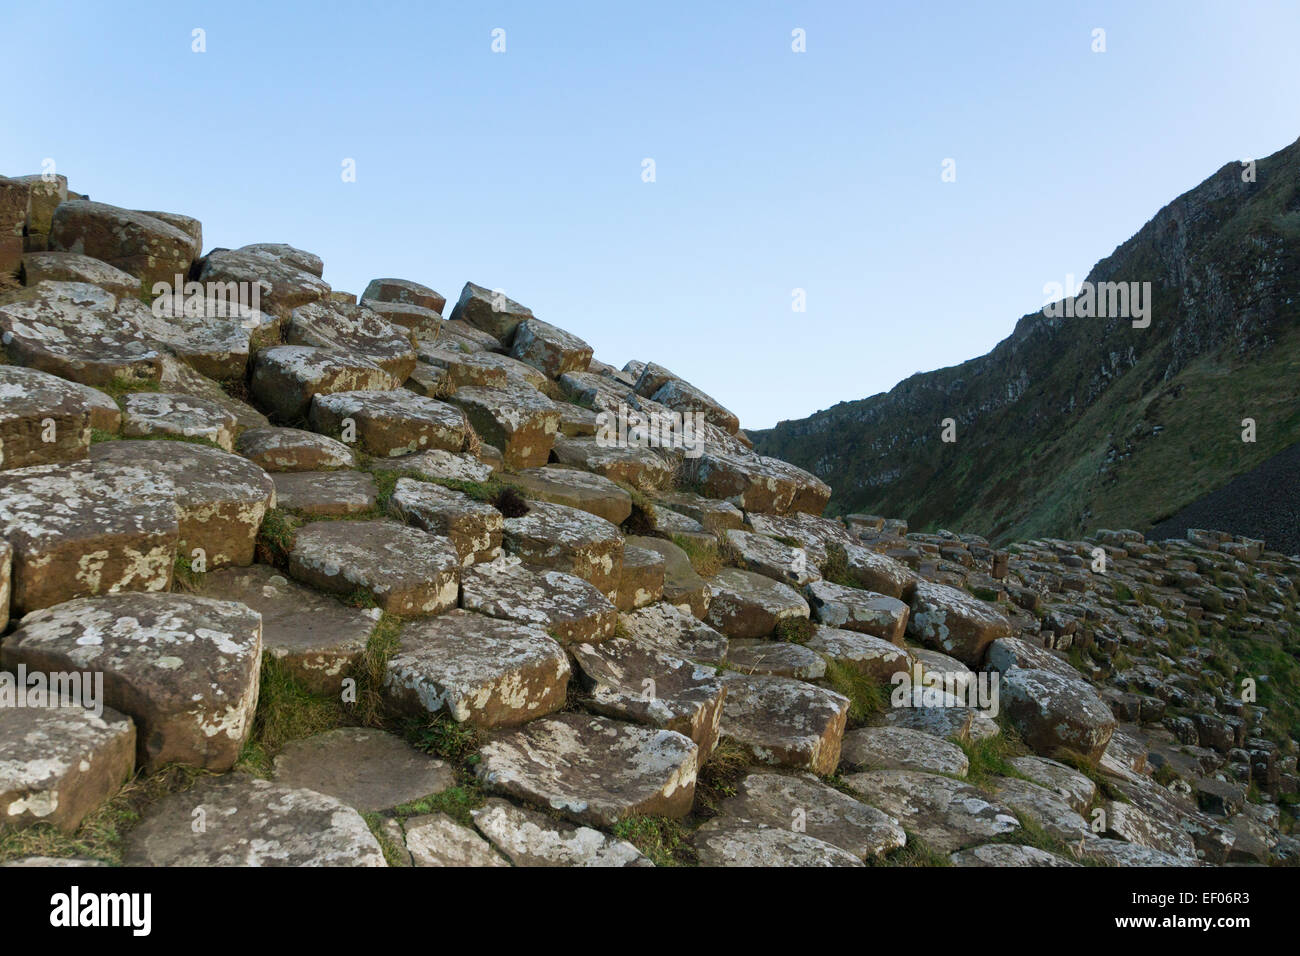 Giant's Causeway, Northern Ireland - Stock Image